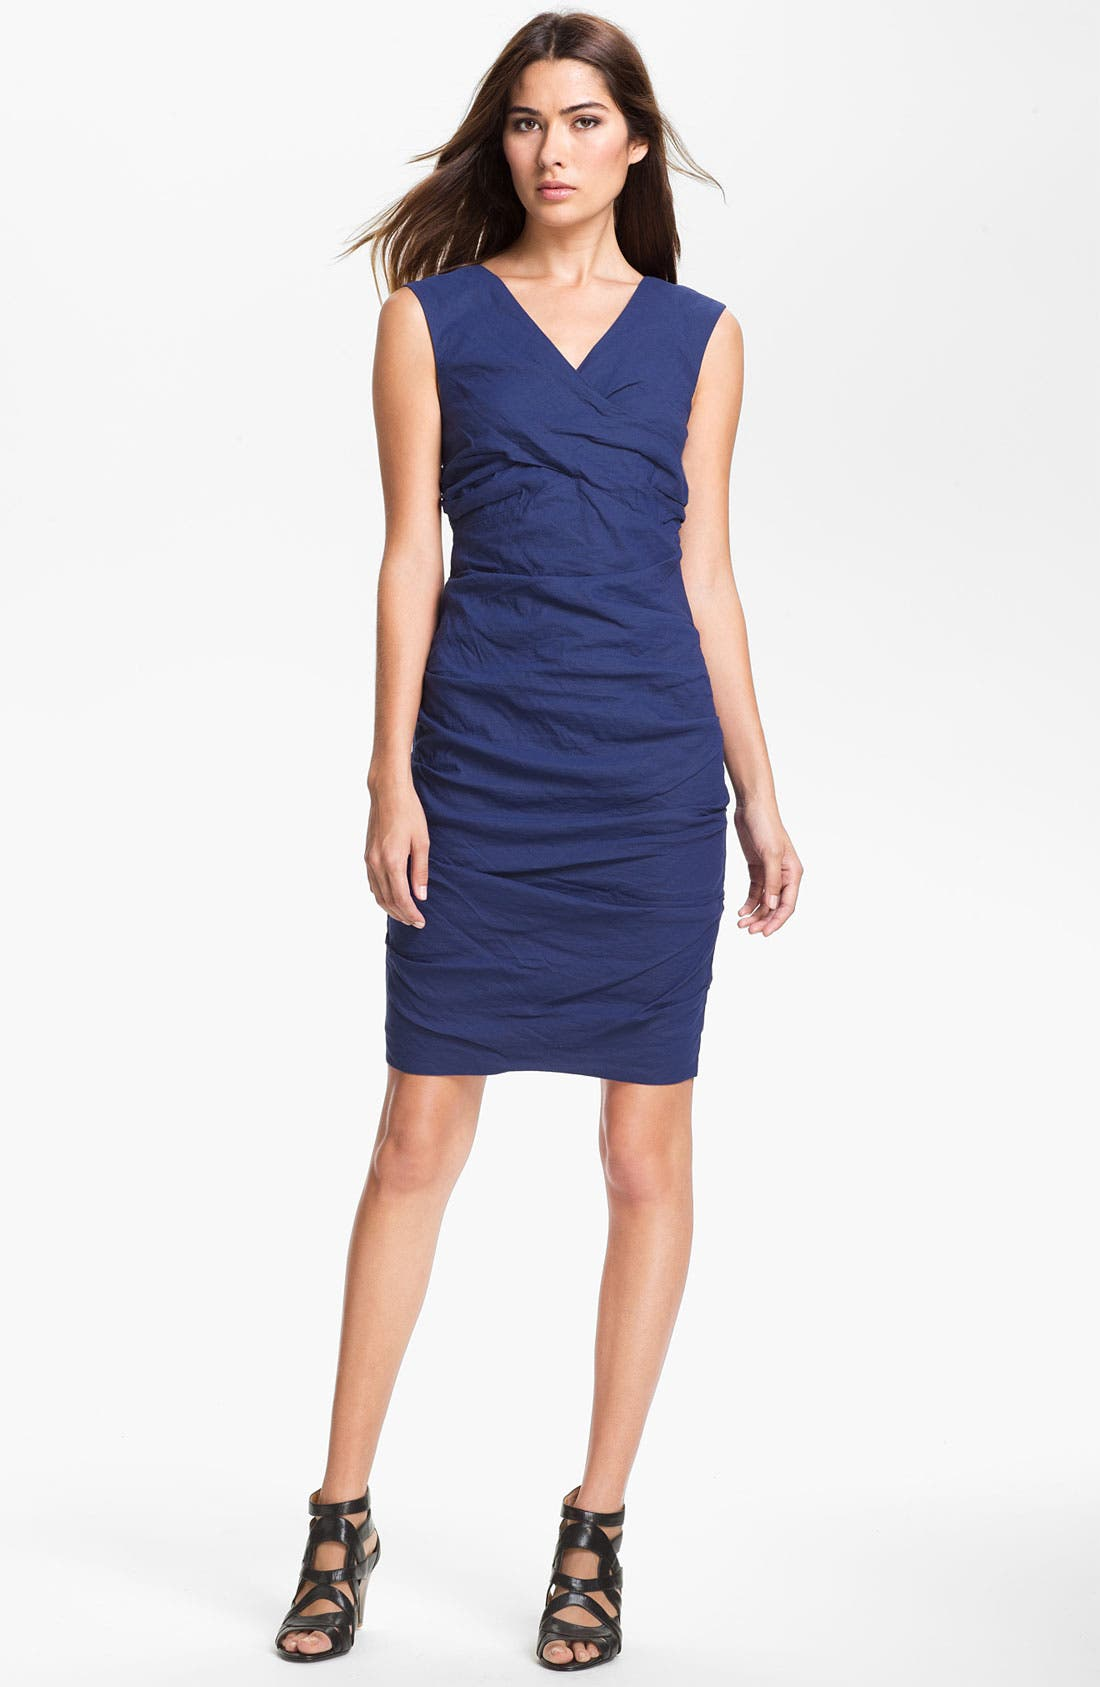 Alternate Image 1 Selected - Eileen Fisher 'Cotton Steel' Faux Wrap Dress